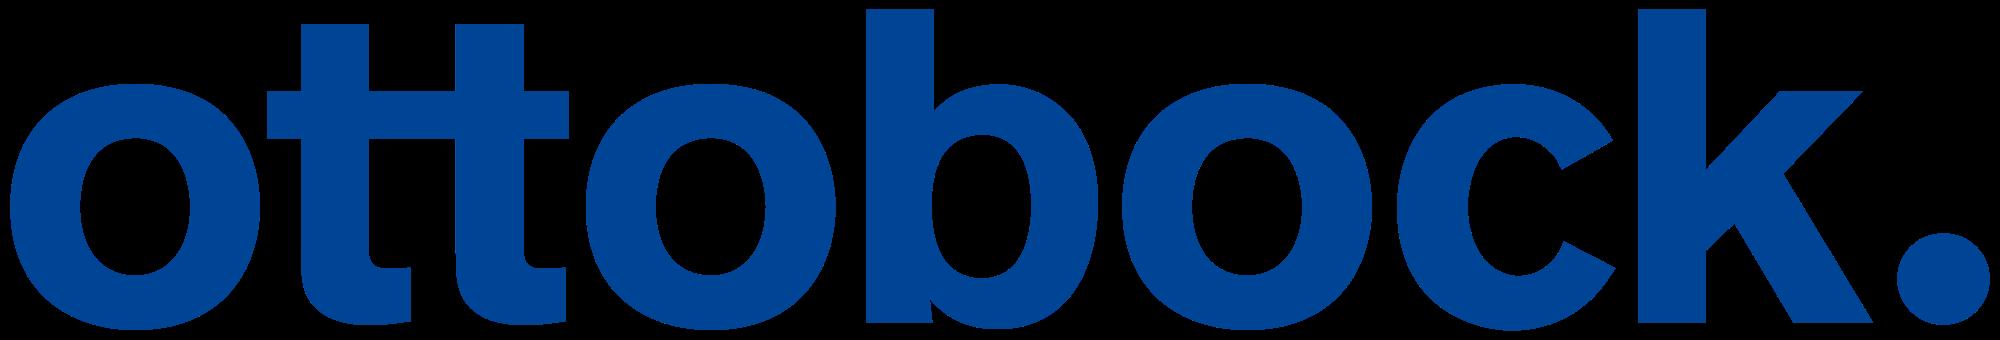 logo ottobock